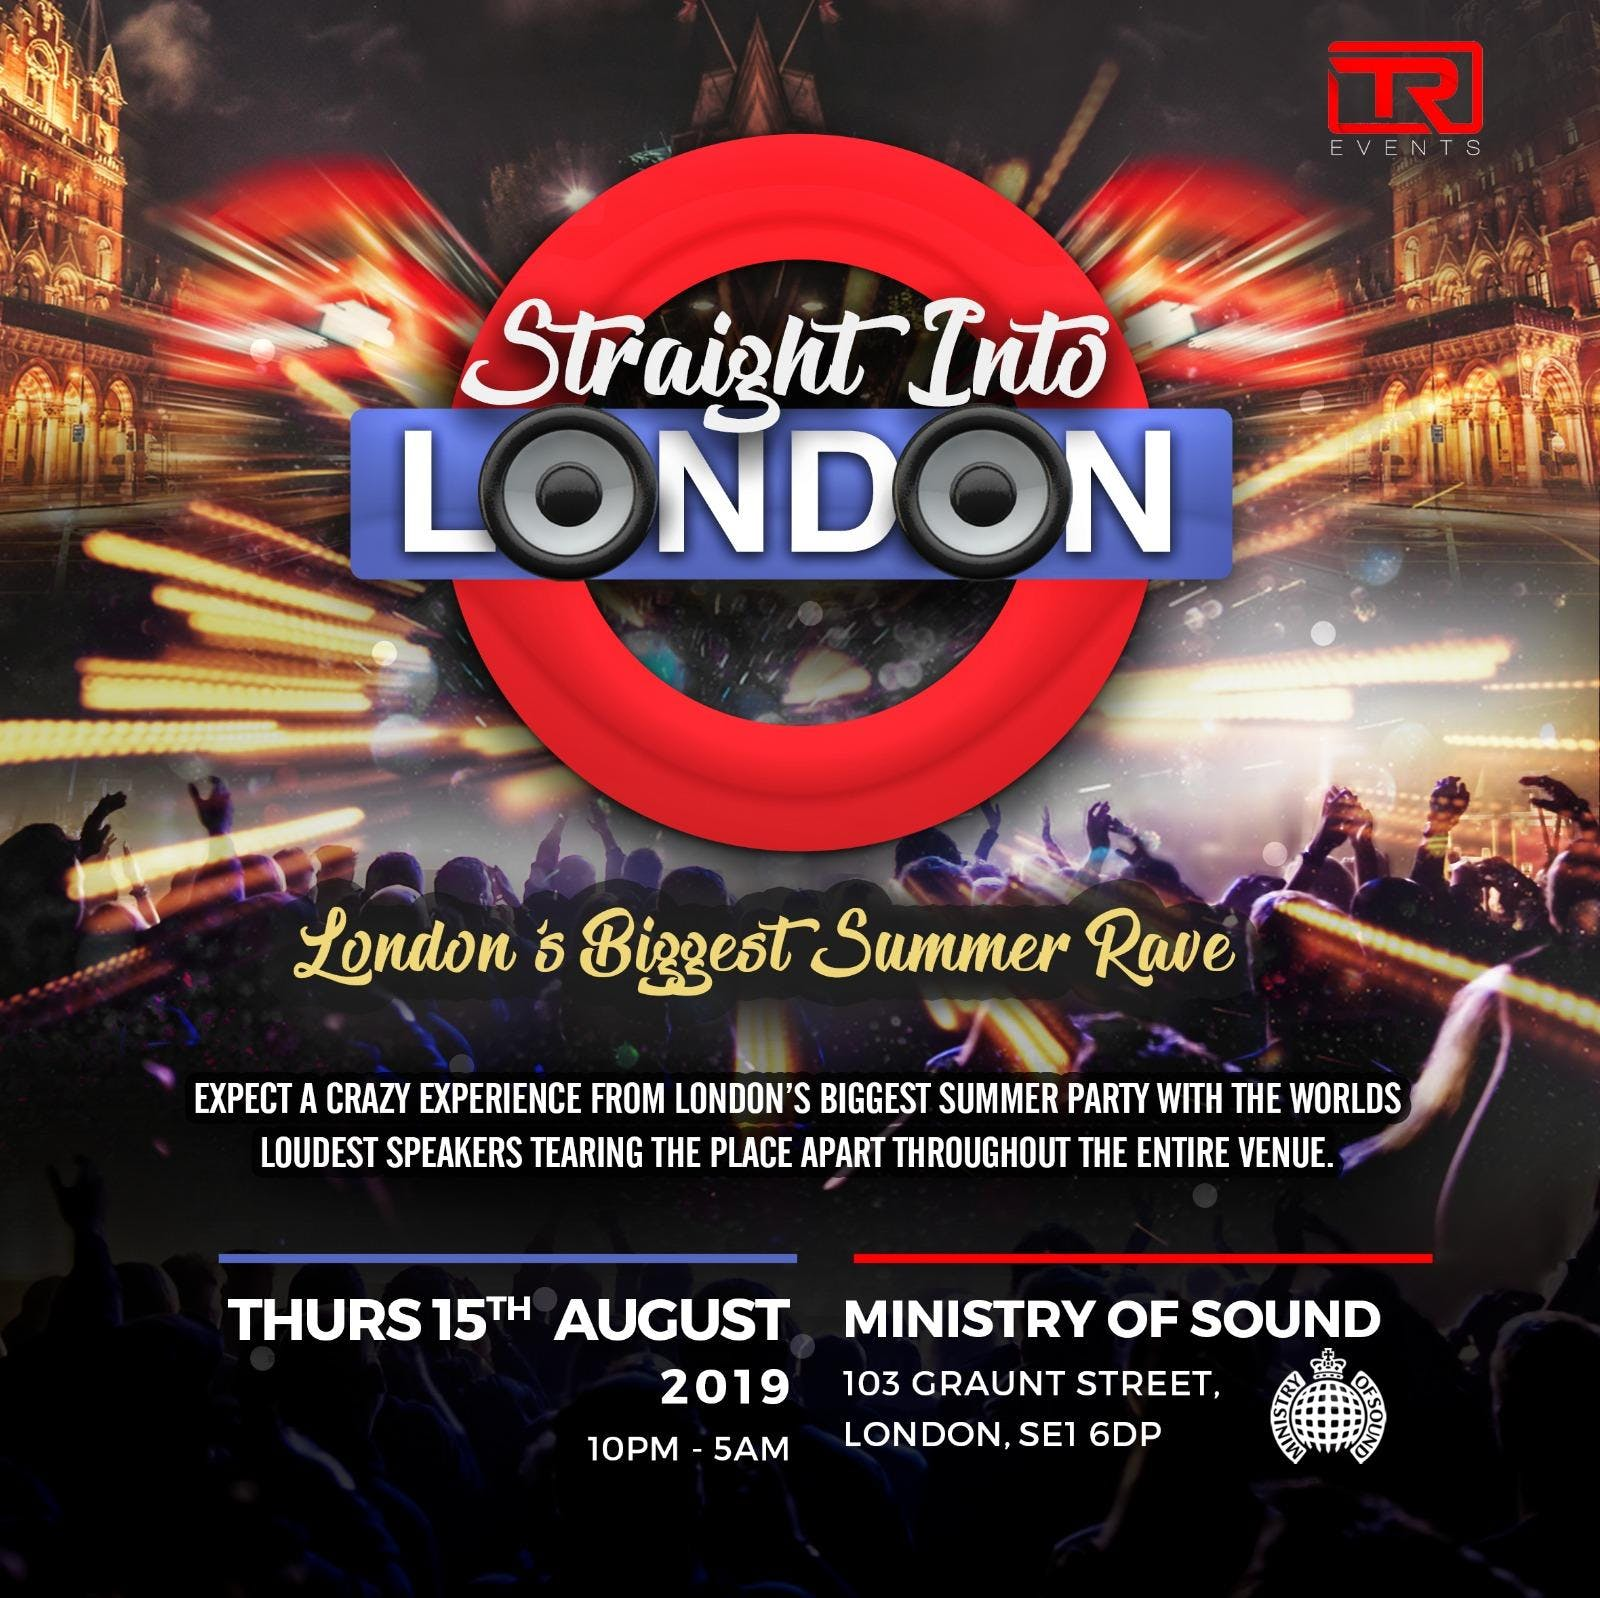 STRAIGHT INTO LONDON